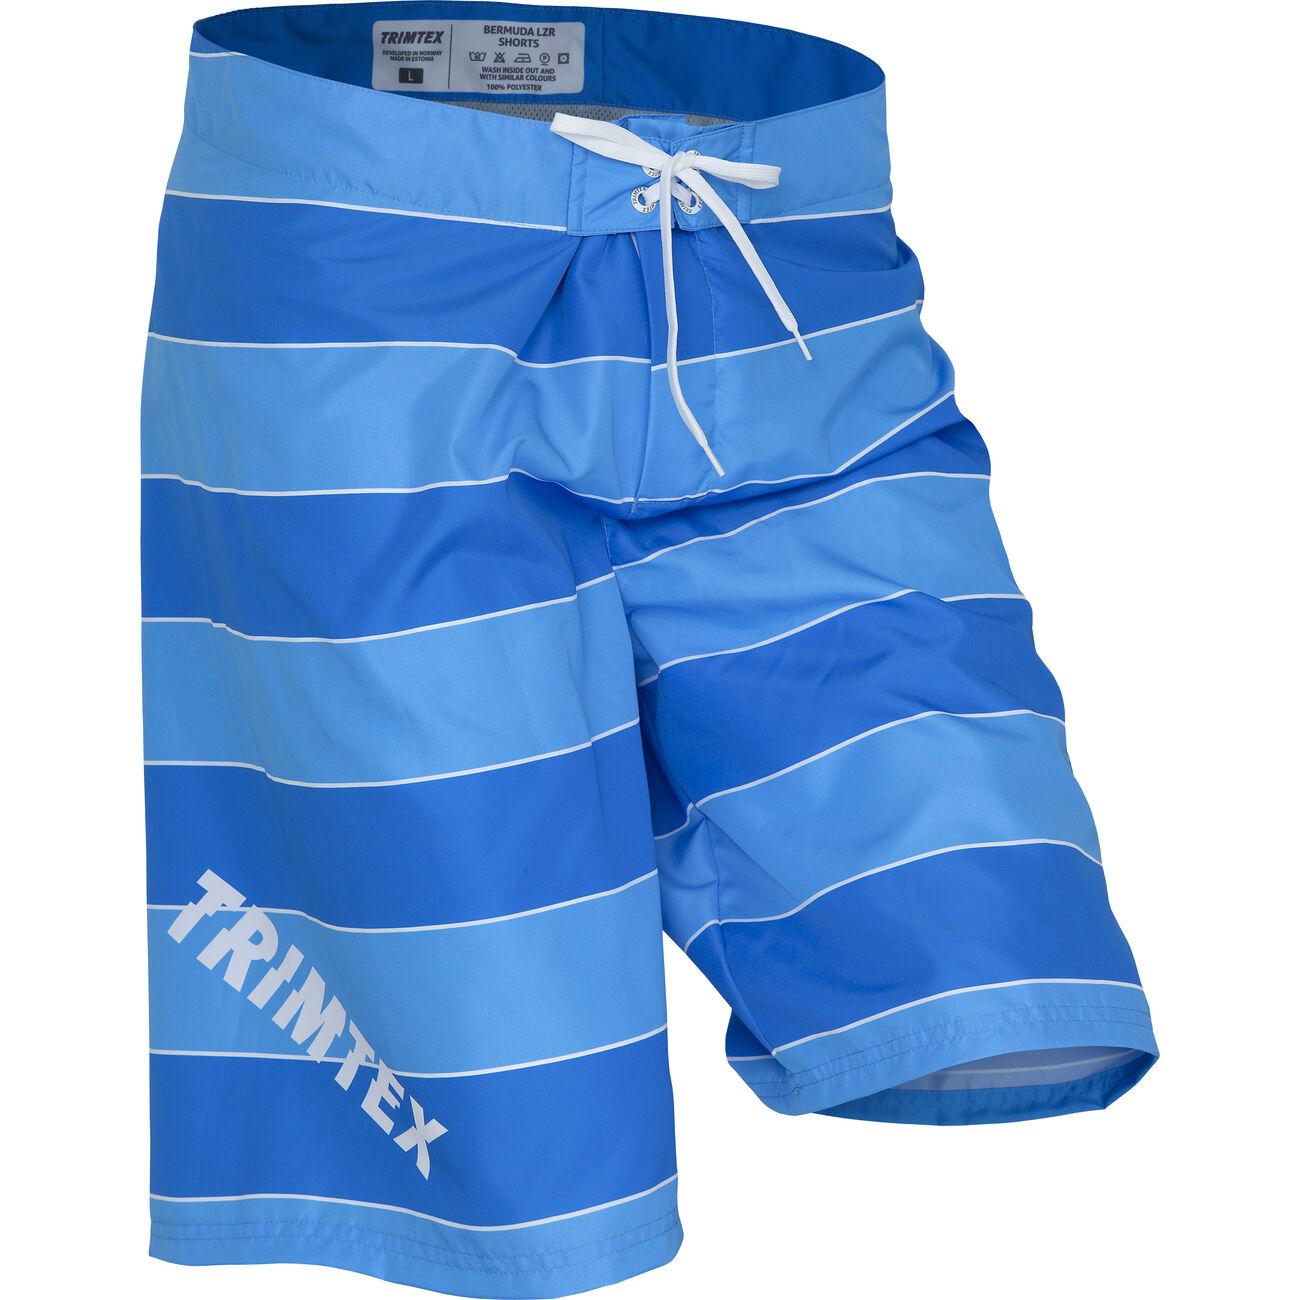 Bermuda shorts herre